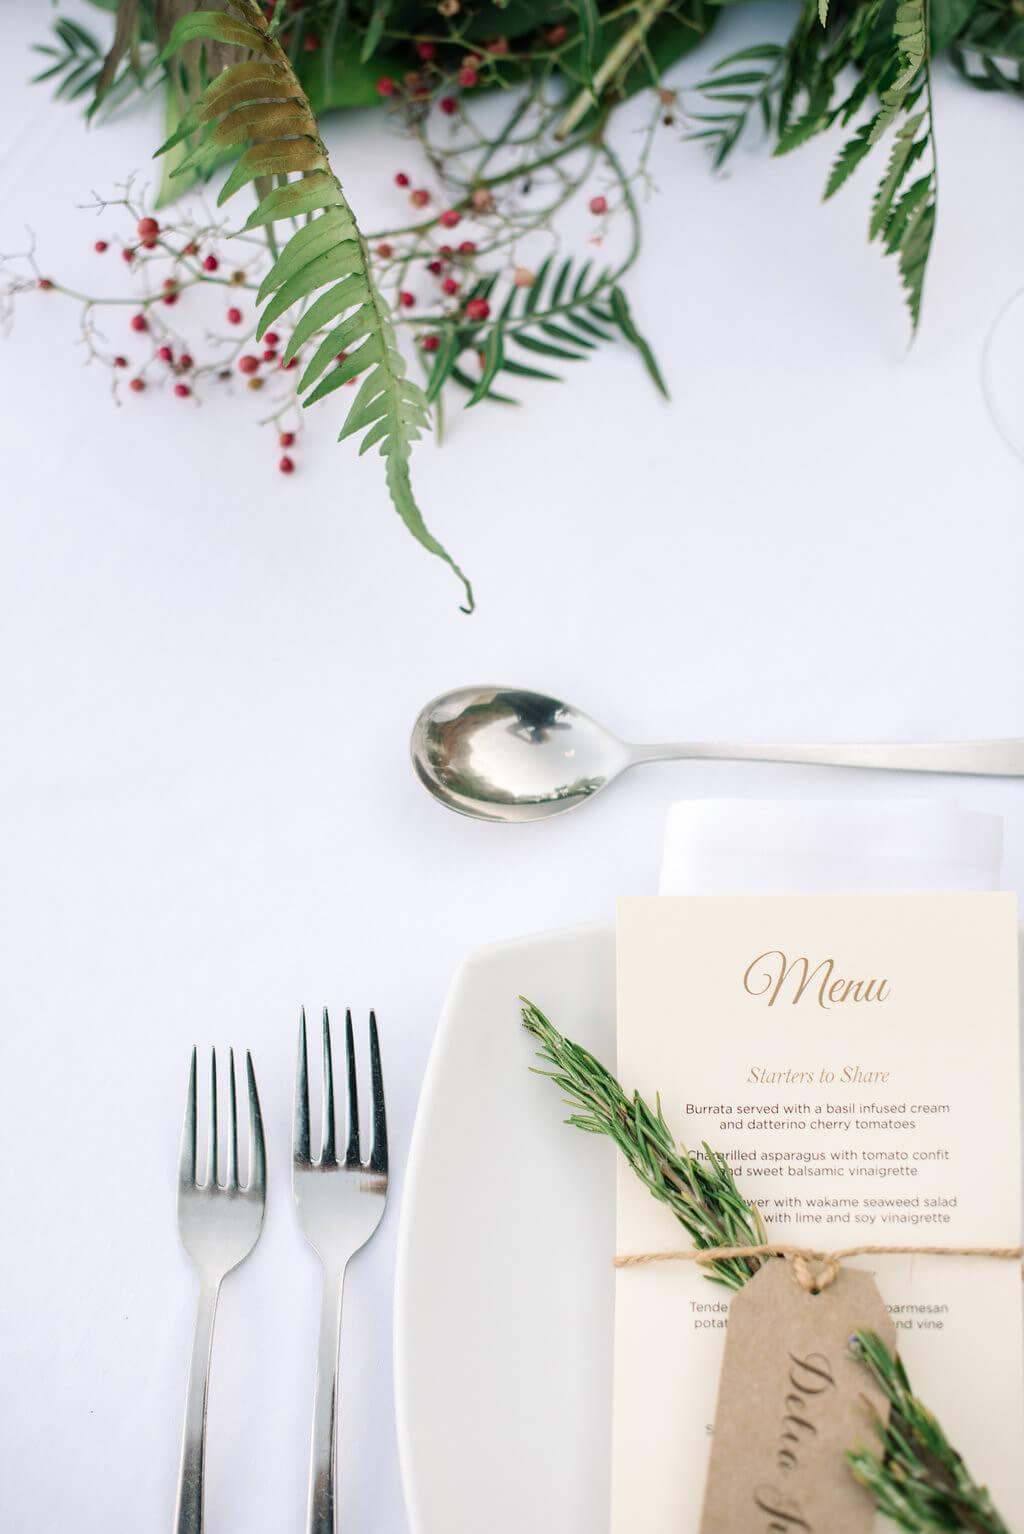 https://www.white-ibiza.com/wp-content/uploads/2020/03/ibiza-wedding-venues-amante-ibiza-2020-07.jpg